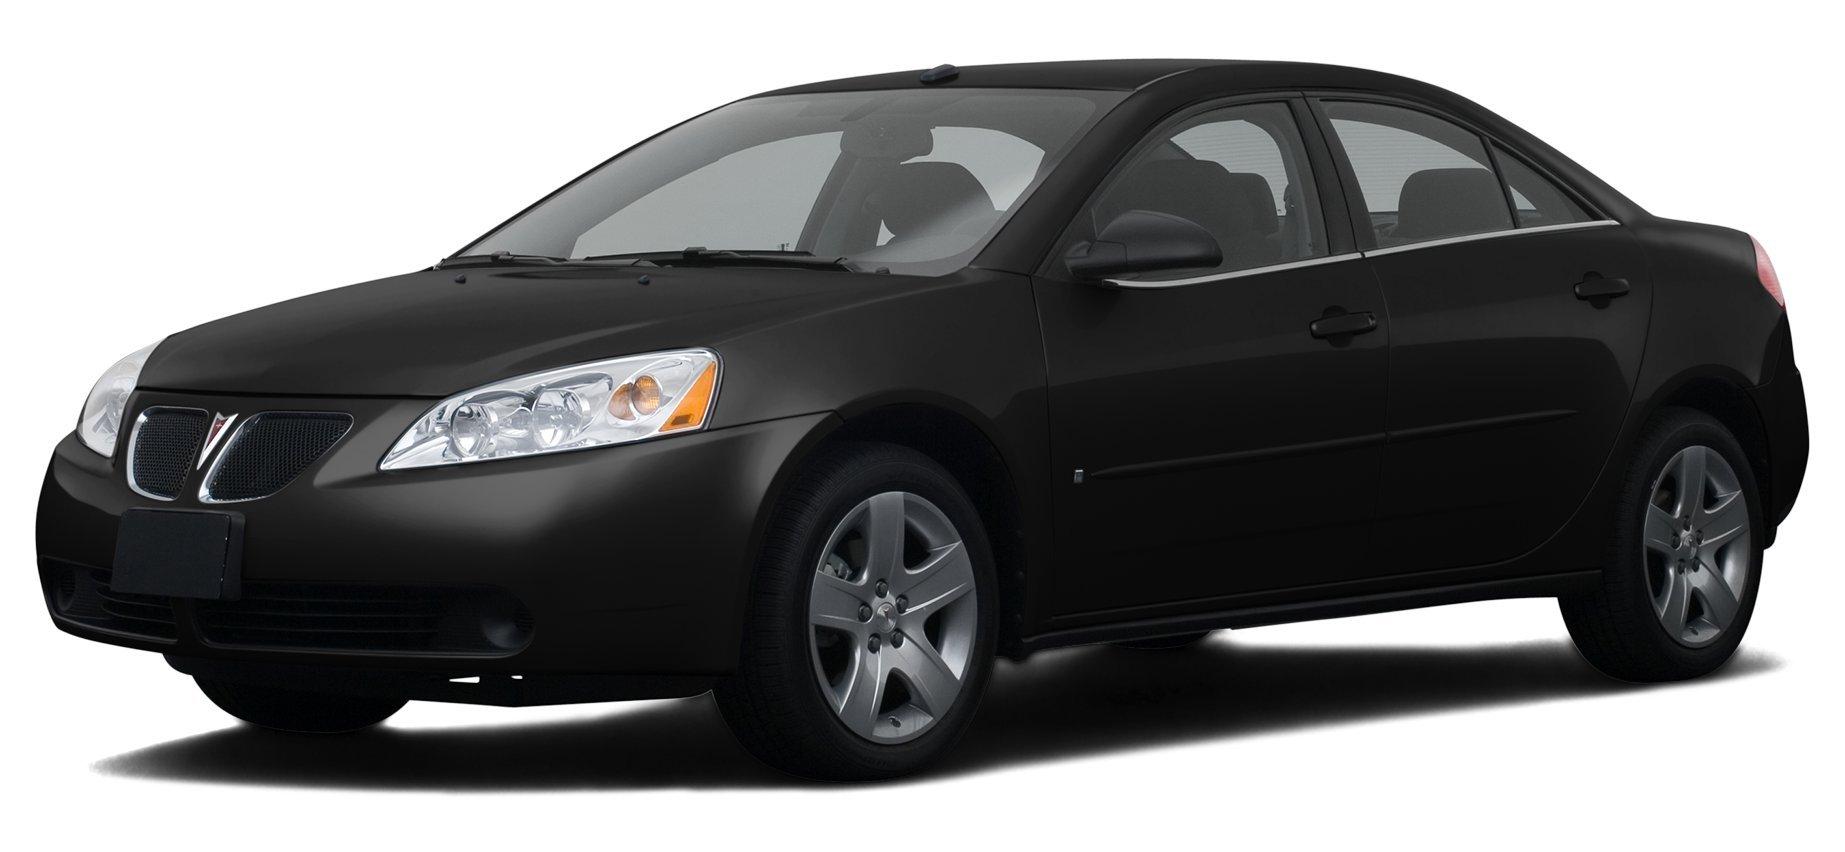 2008 Pontiac G6 1SV Value Leader 4 Door Sedan Hyundai Sonata